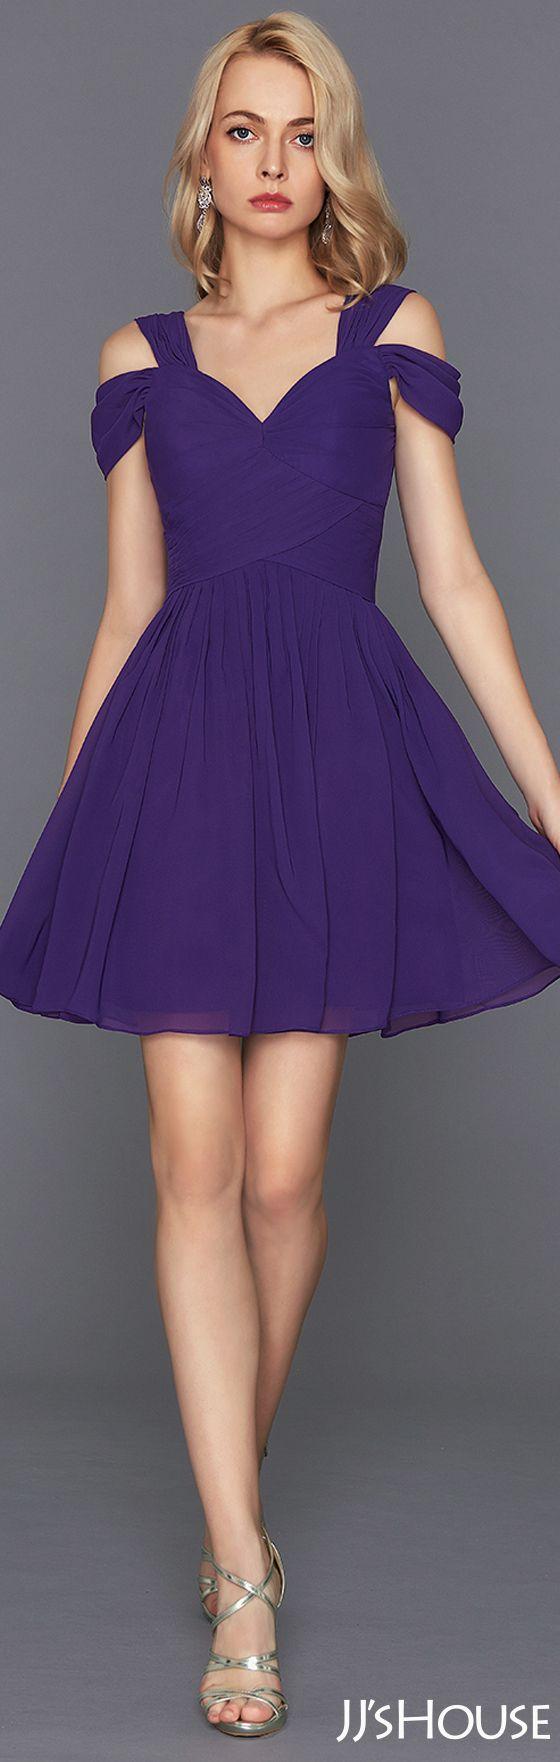 Excellent cocktail dress and excellent design!  #JJsHouse #Cocktail